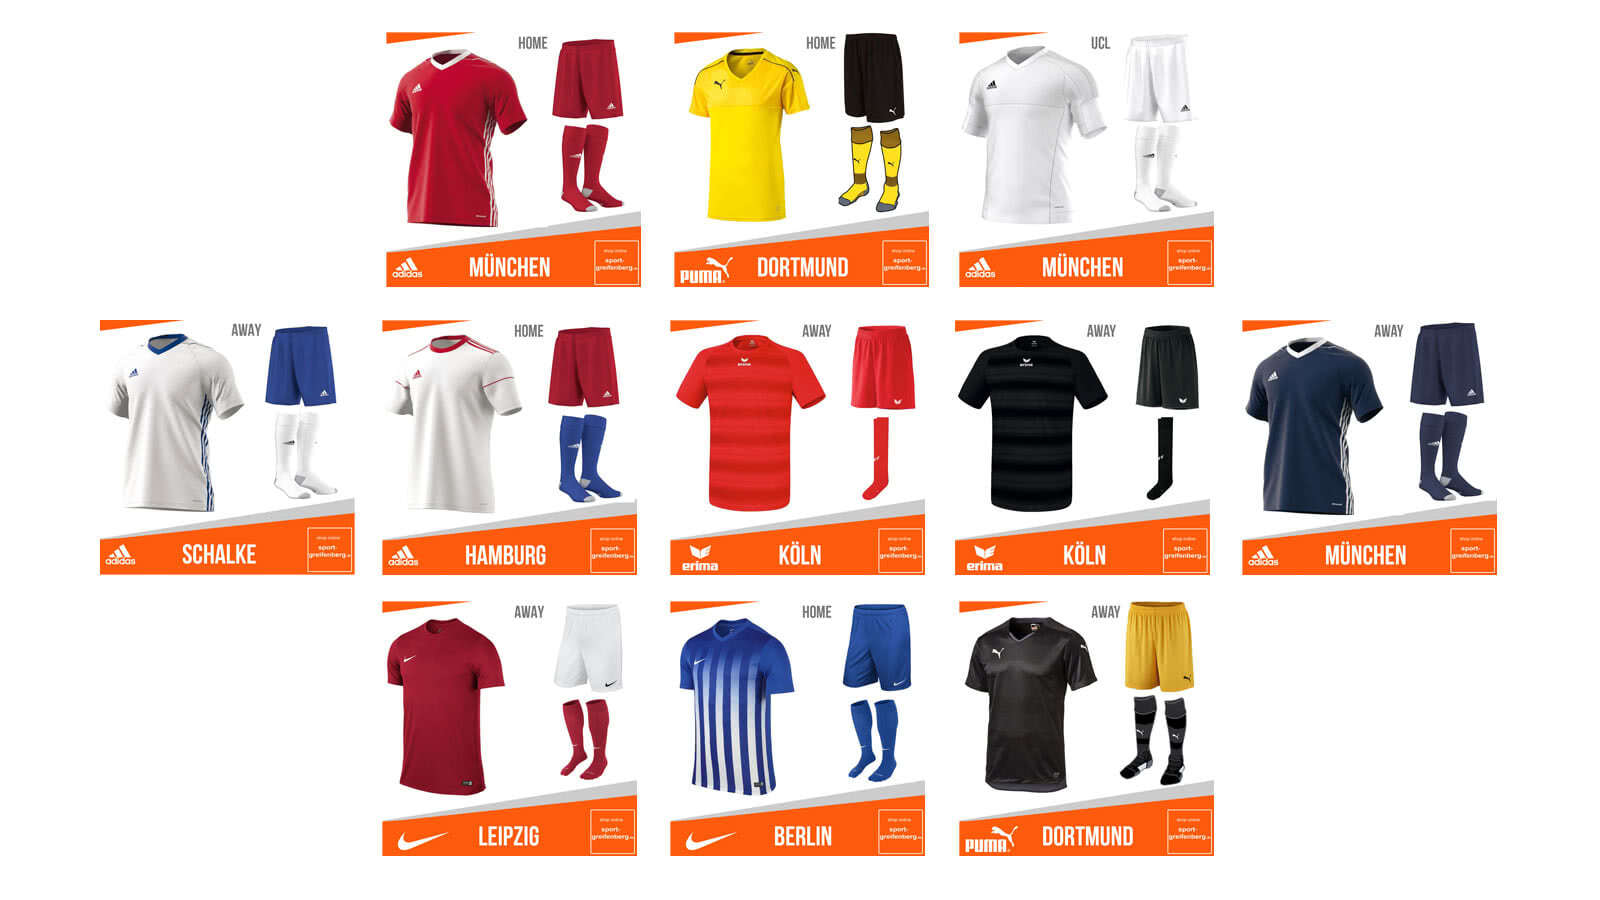 Bundesliga trikots hosen stutzen 2017 2018 sportartikel for Bundesliga trikots